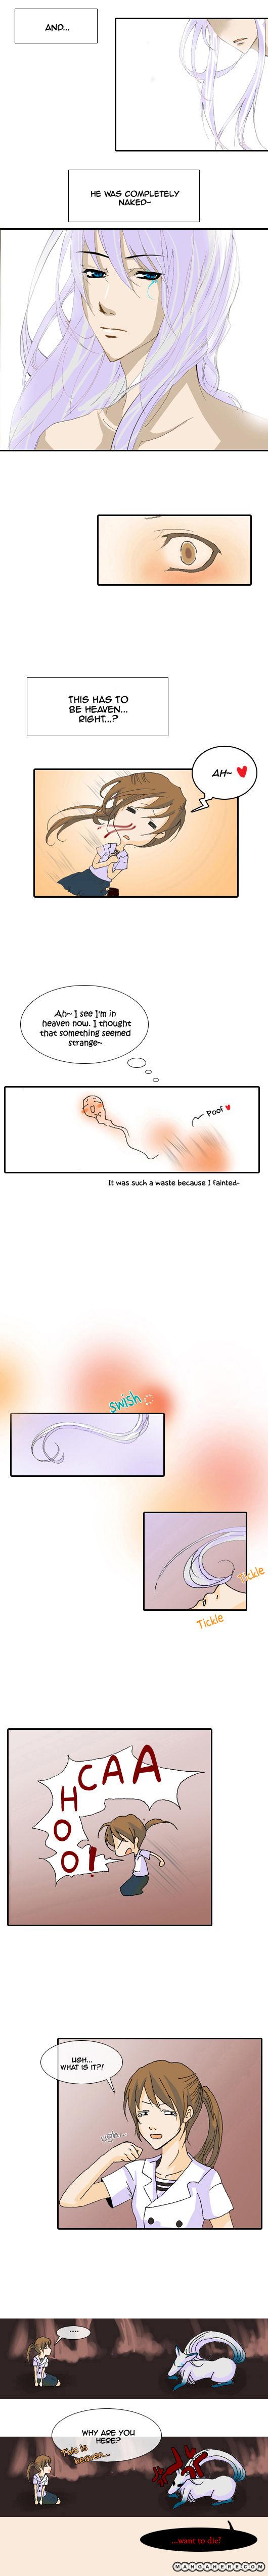 Nweho 3 Page 2